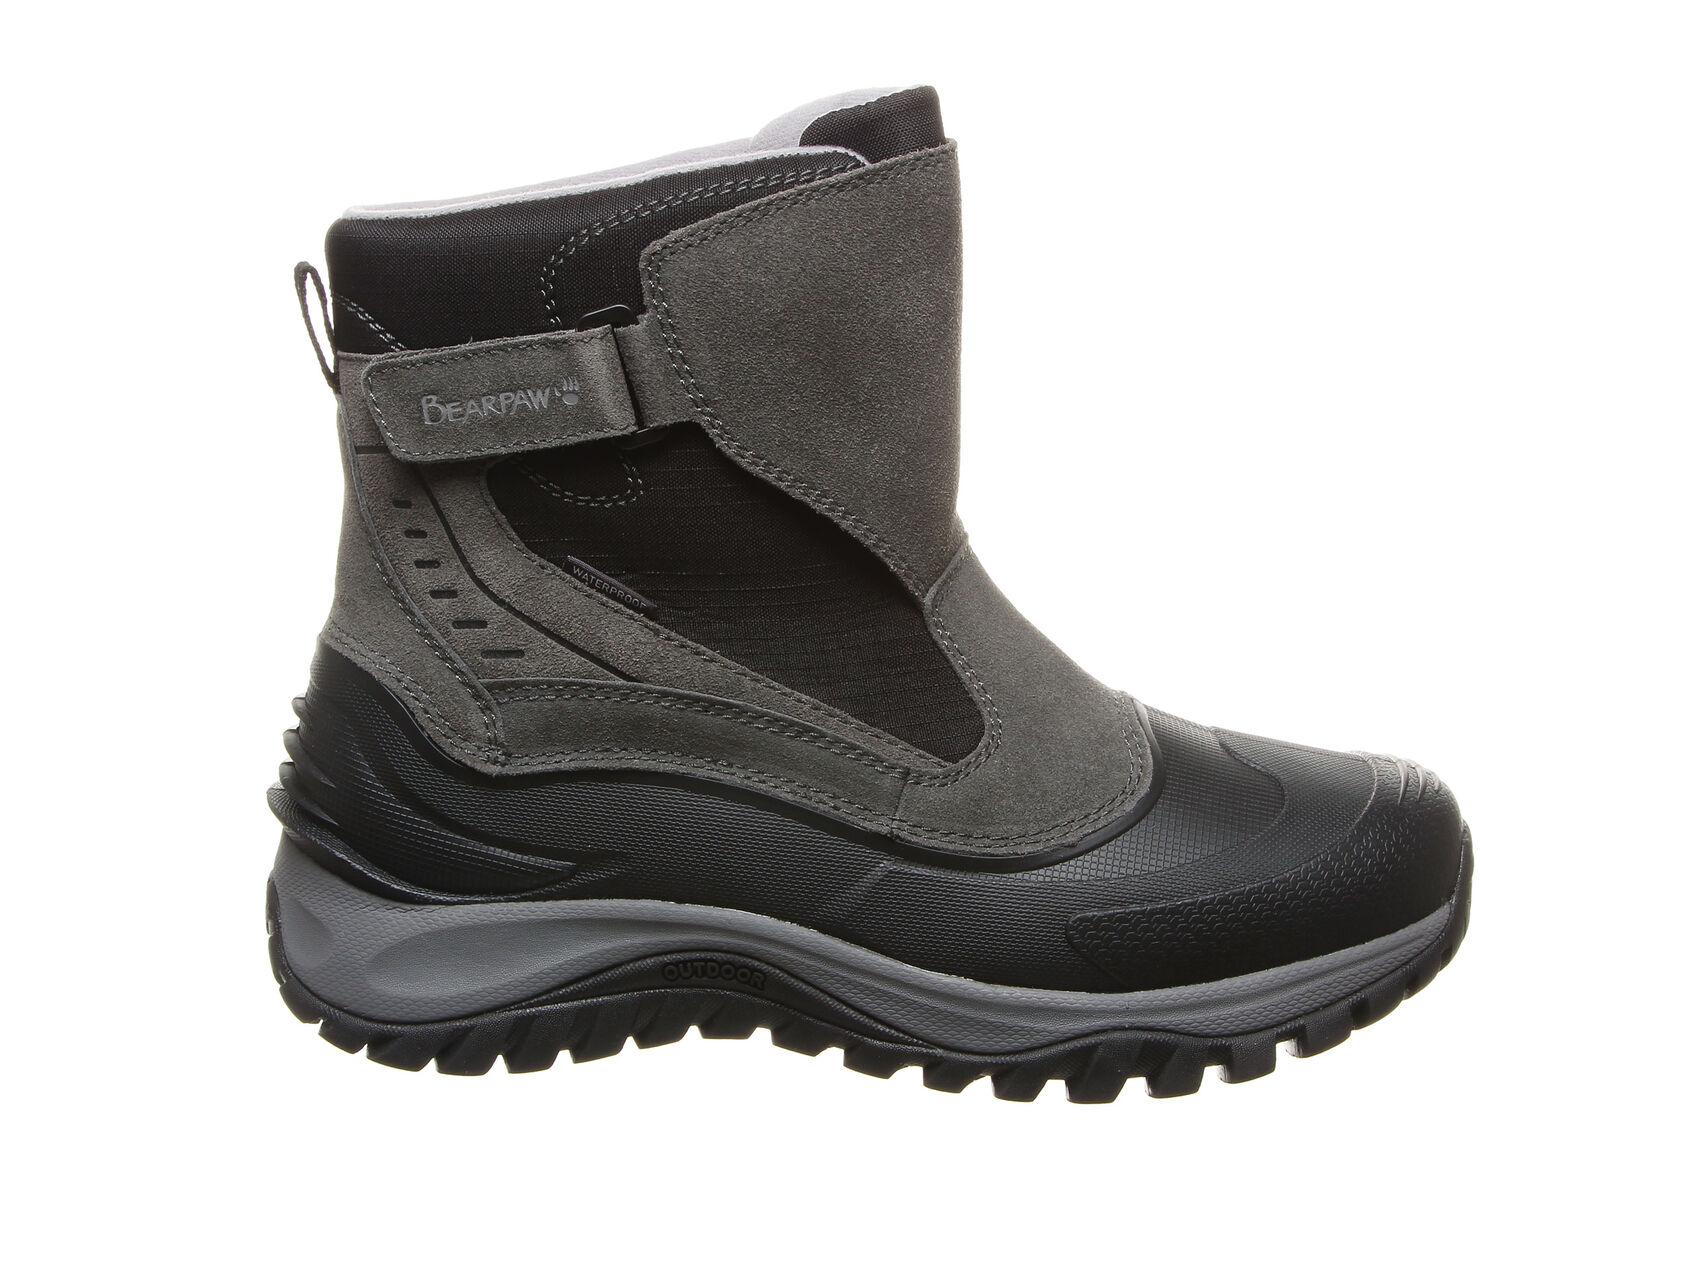 1c408c113294 Men  39 s Bearpaw Overland Winter Boots. Previous